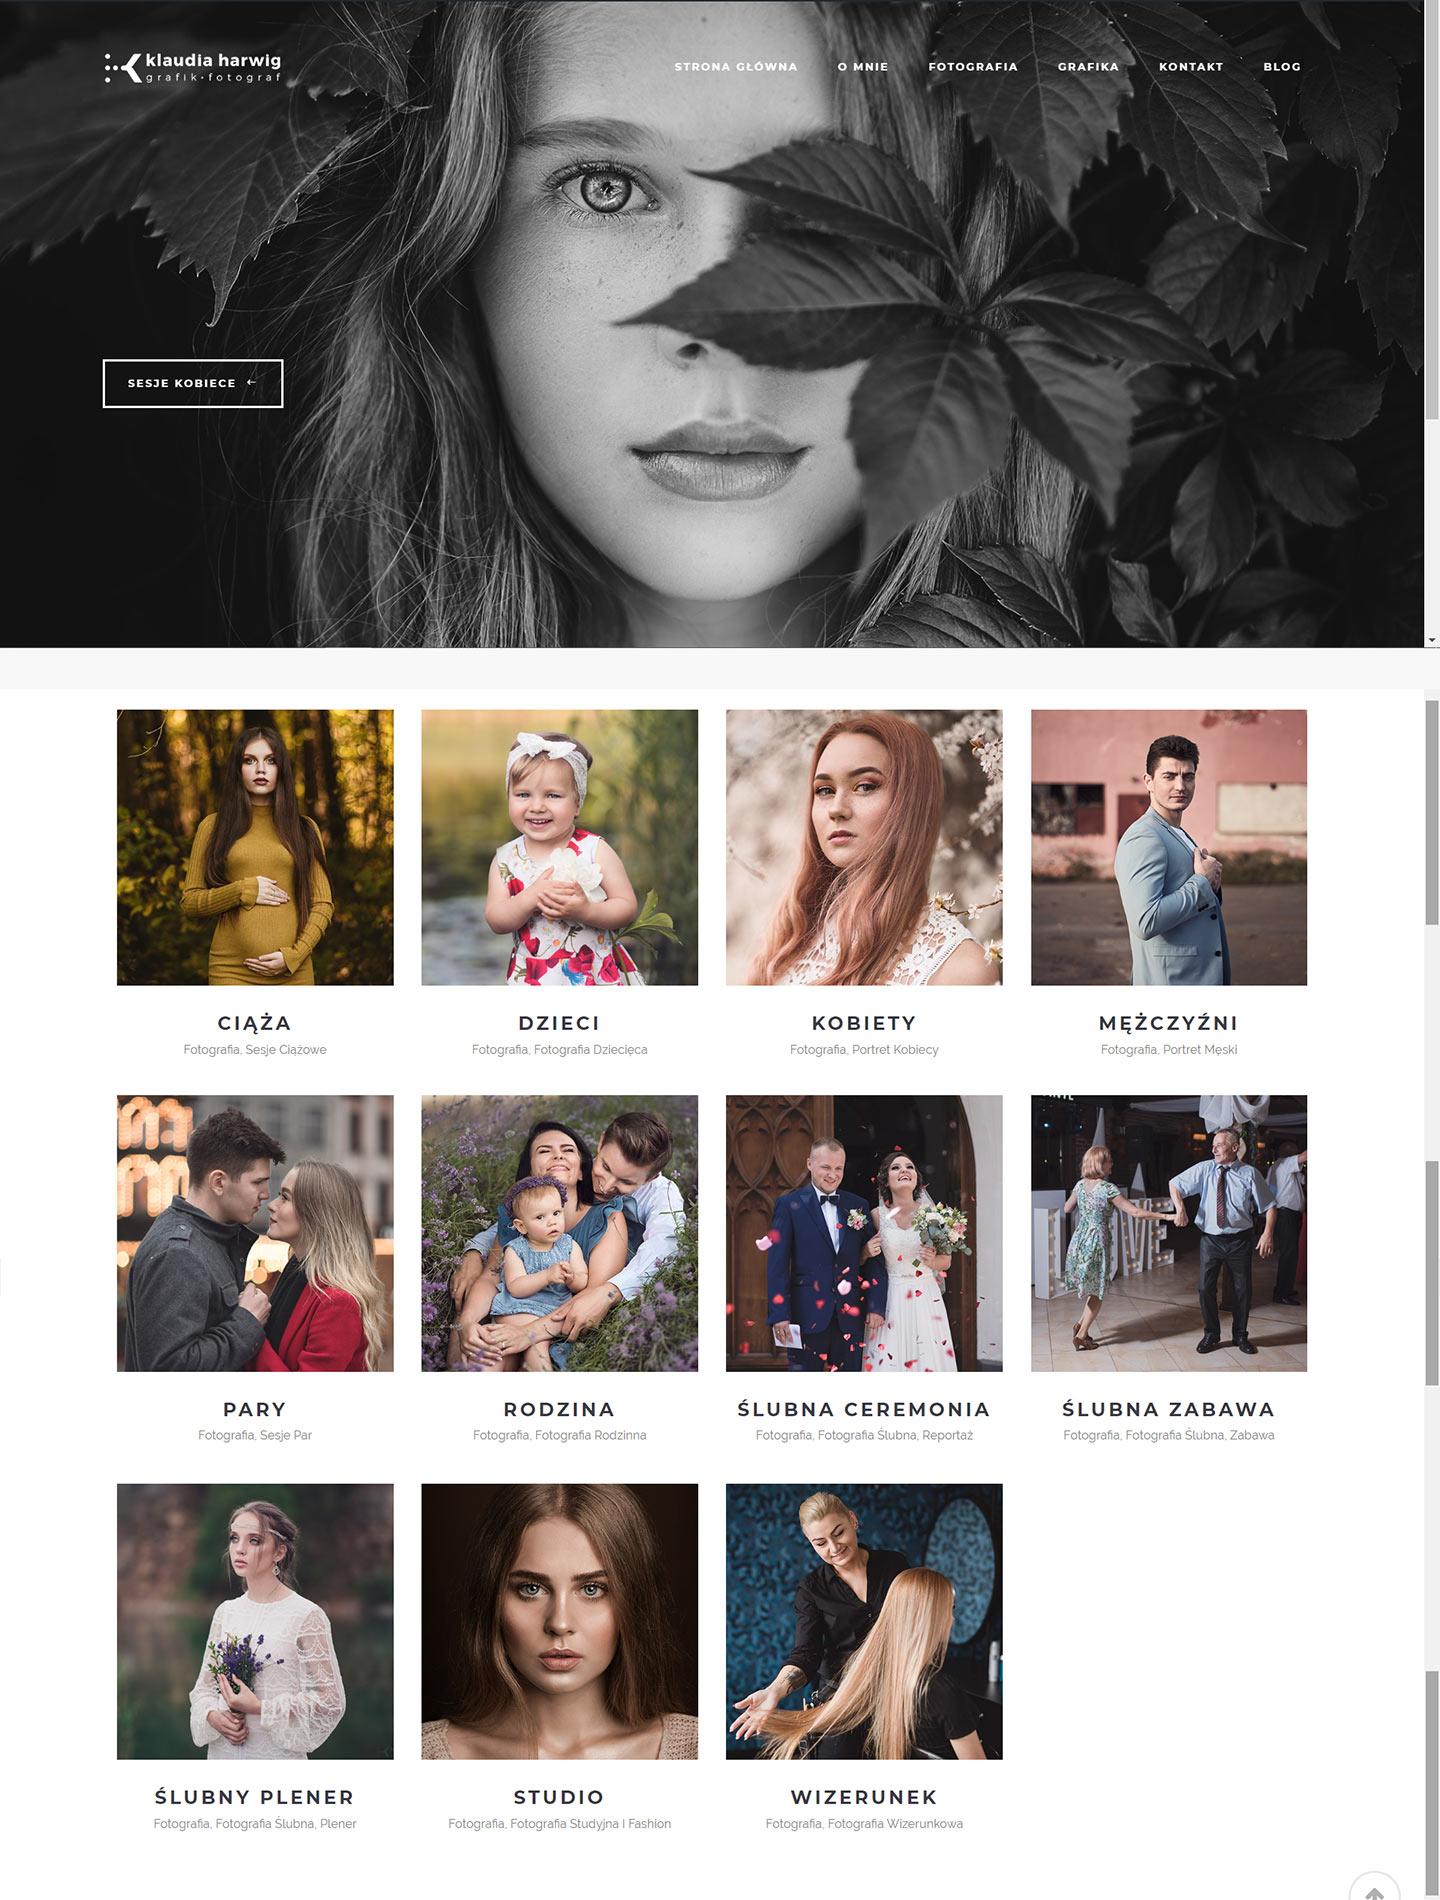 klaudiaharwig-pl-strona-www-fotograf>